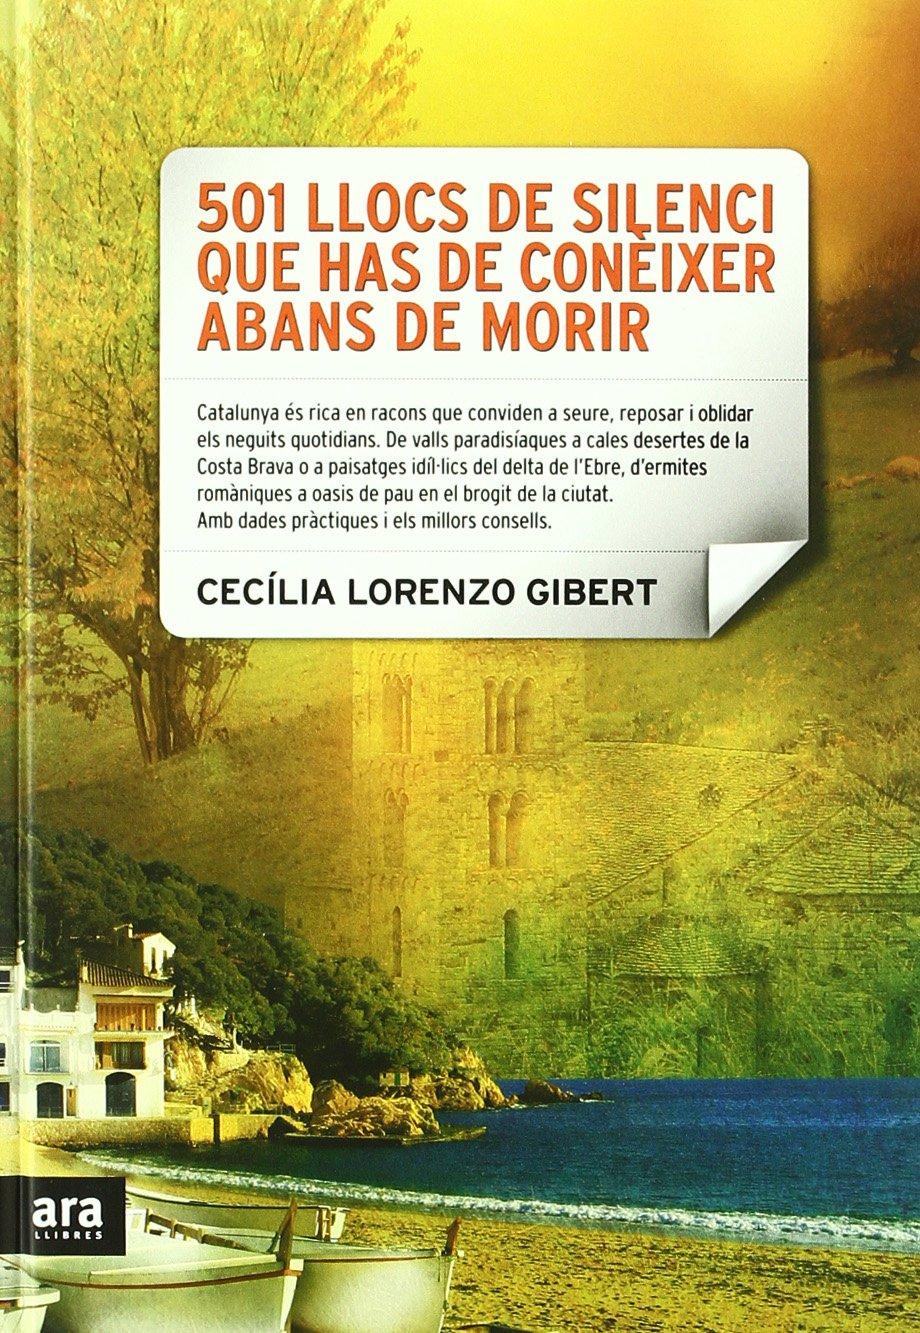 501 llocs de silenci que has de conèixer abans de morir (Catalán) Tapa dura – 7 oct 2010 Cecília Lorenzo Gibert Ara llibres 8492907584 EDUCATION / General